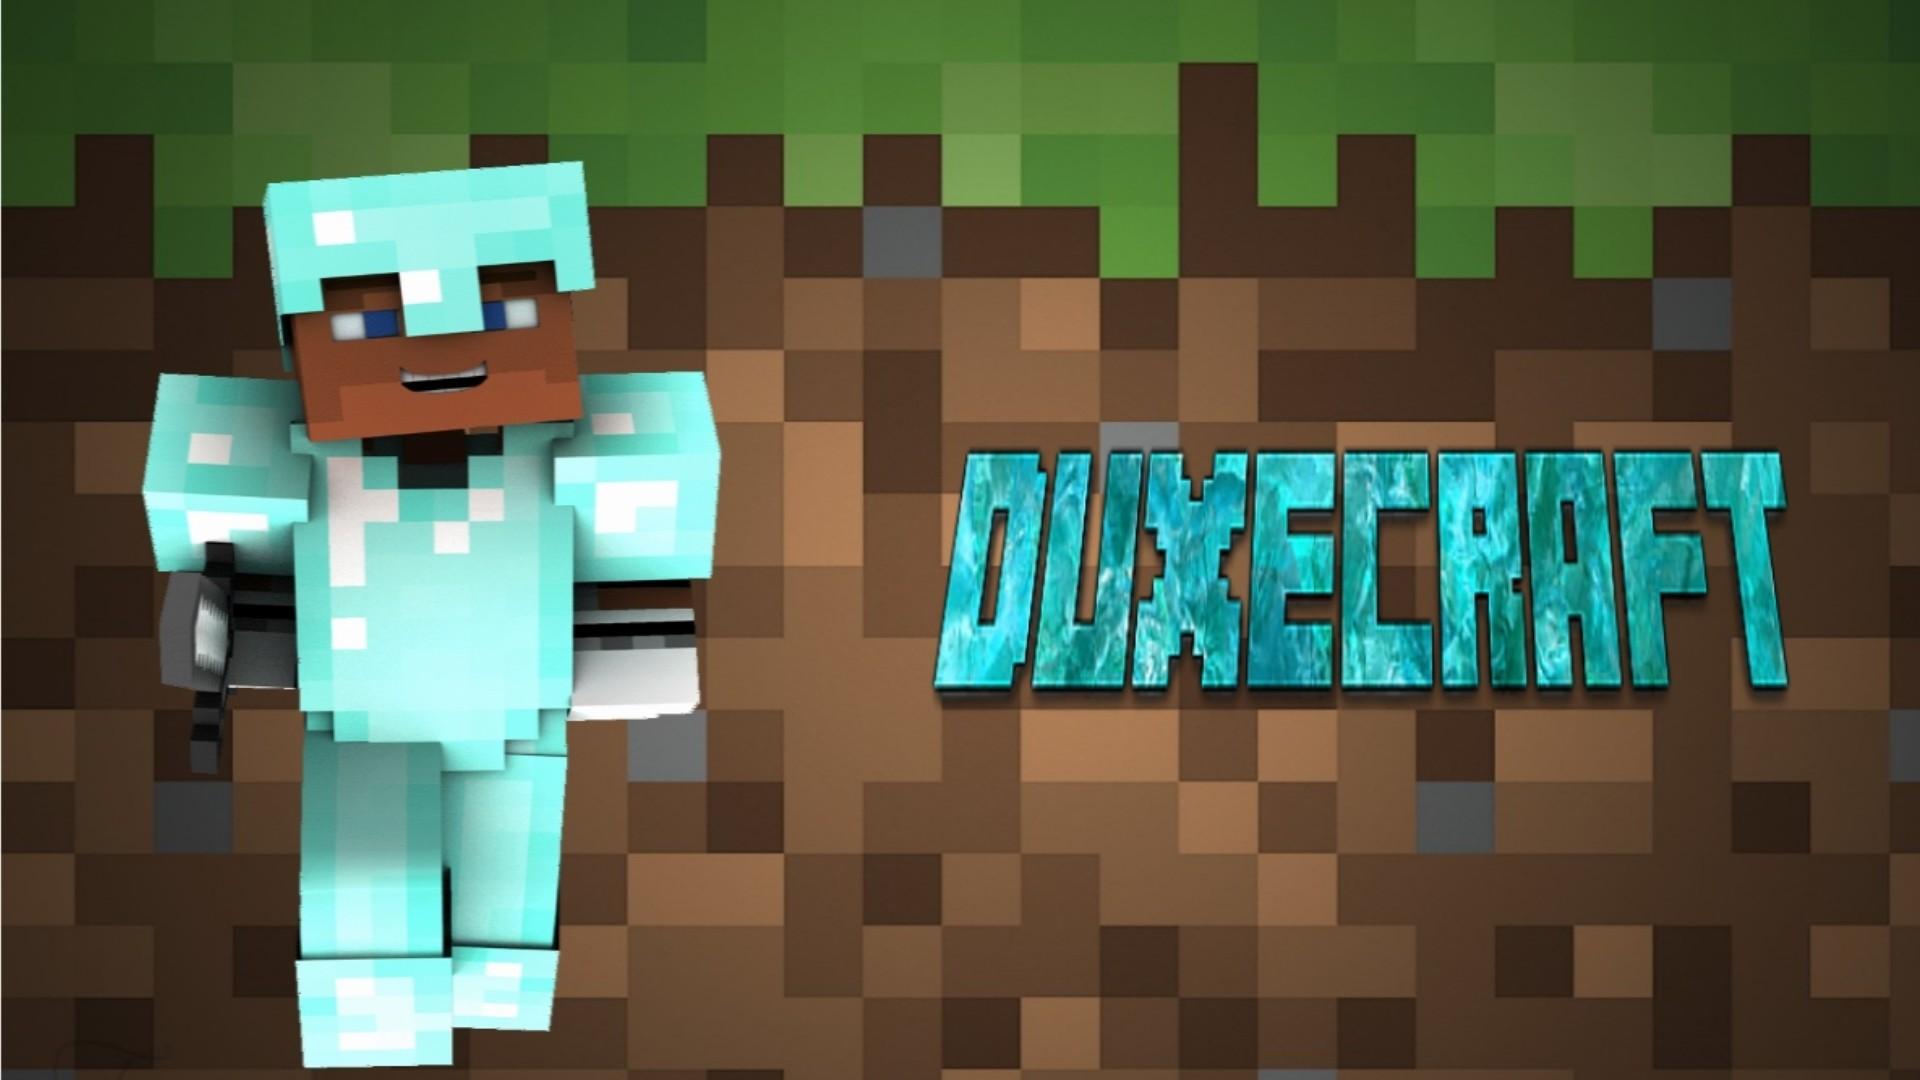 illustration text symmetry Minecraft green Toy brand color shape design number screenshot 1920x1080 px font